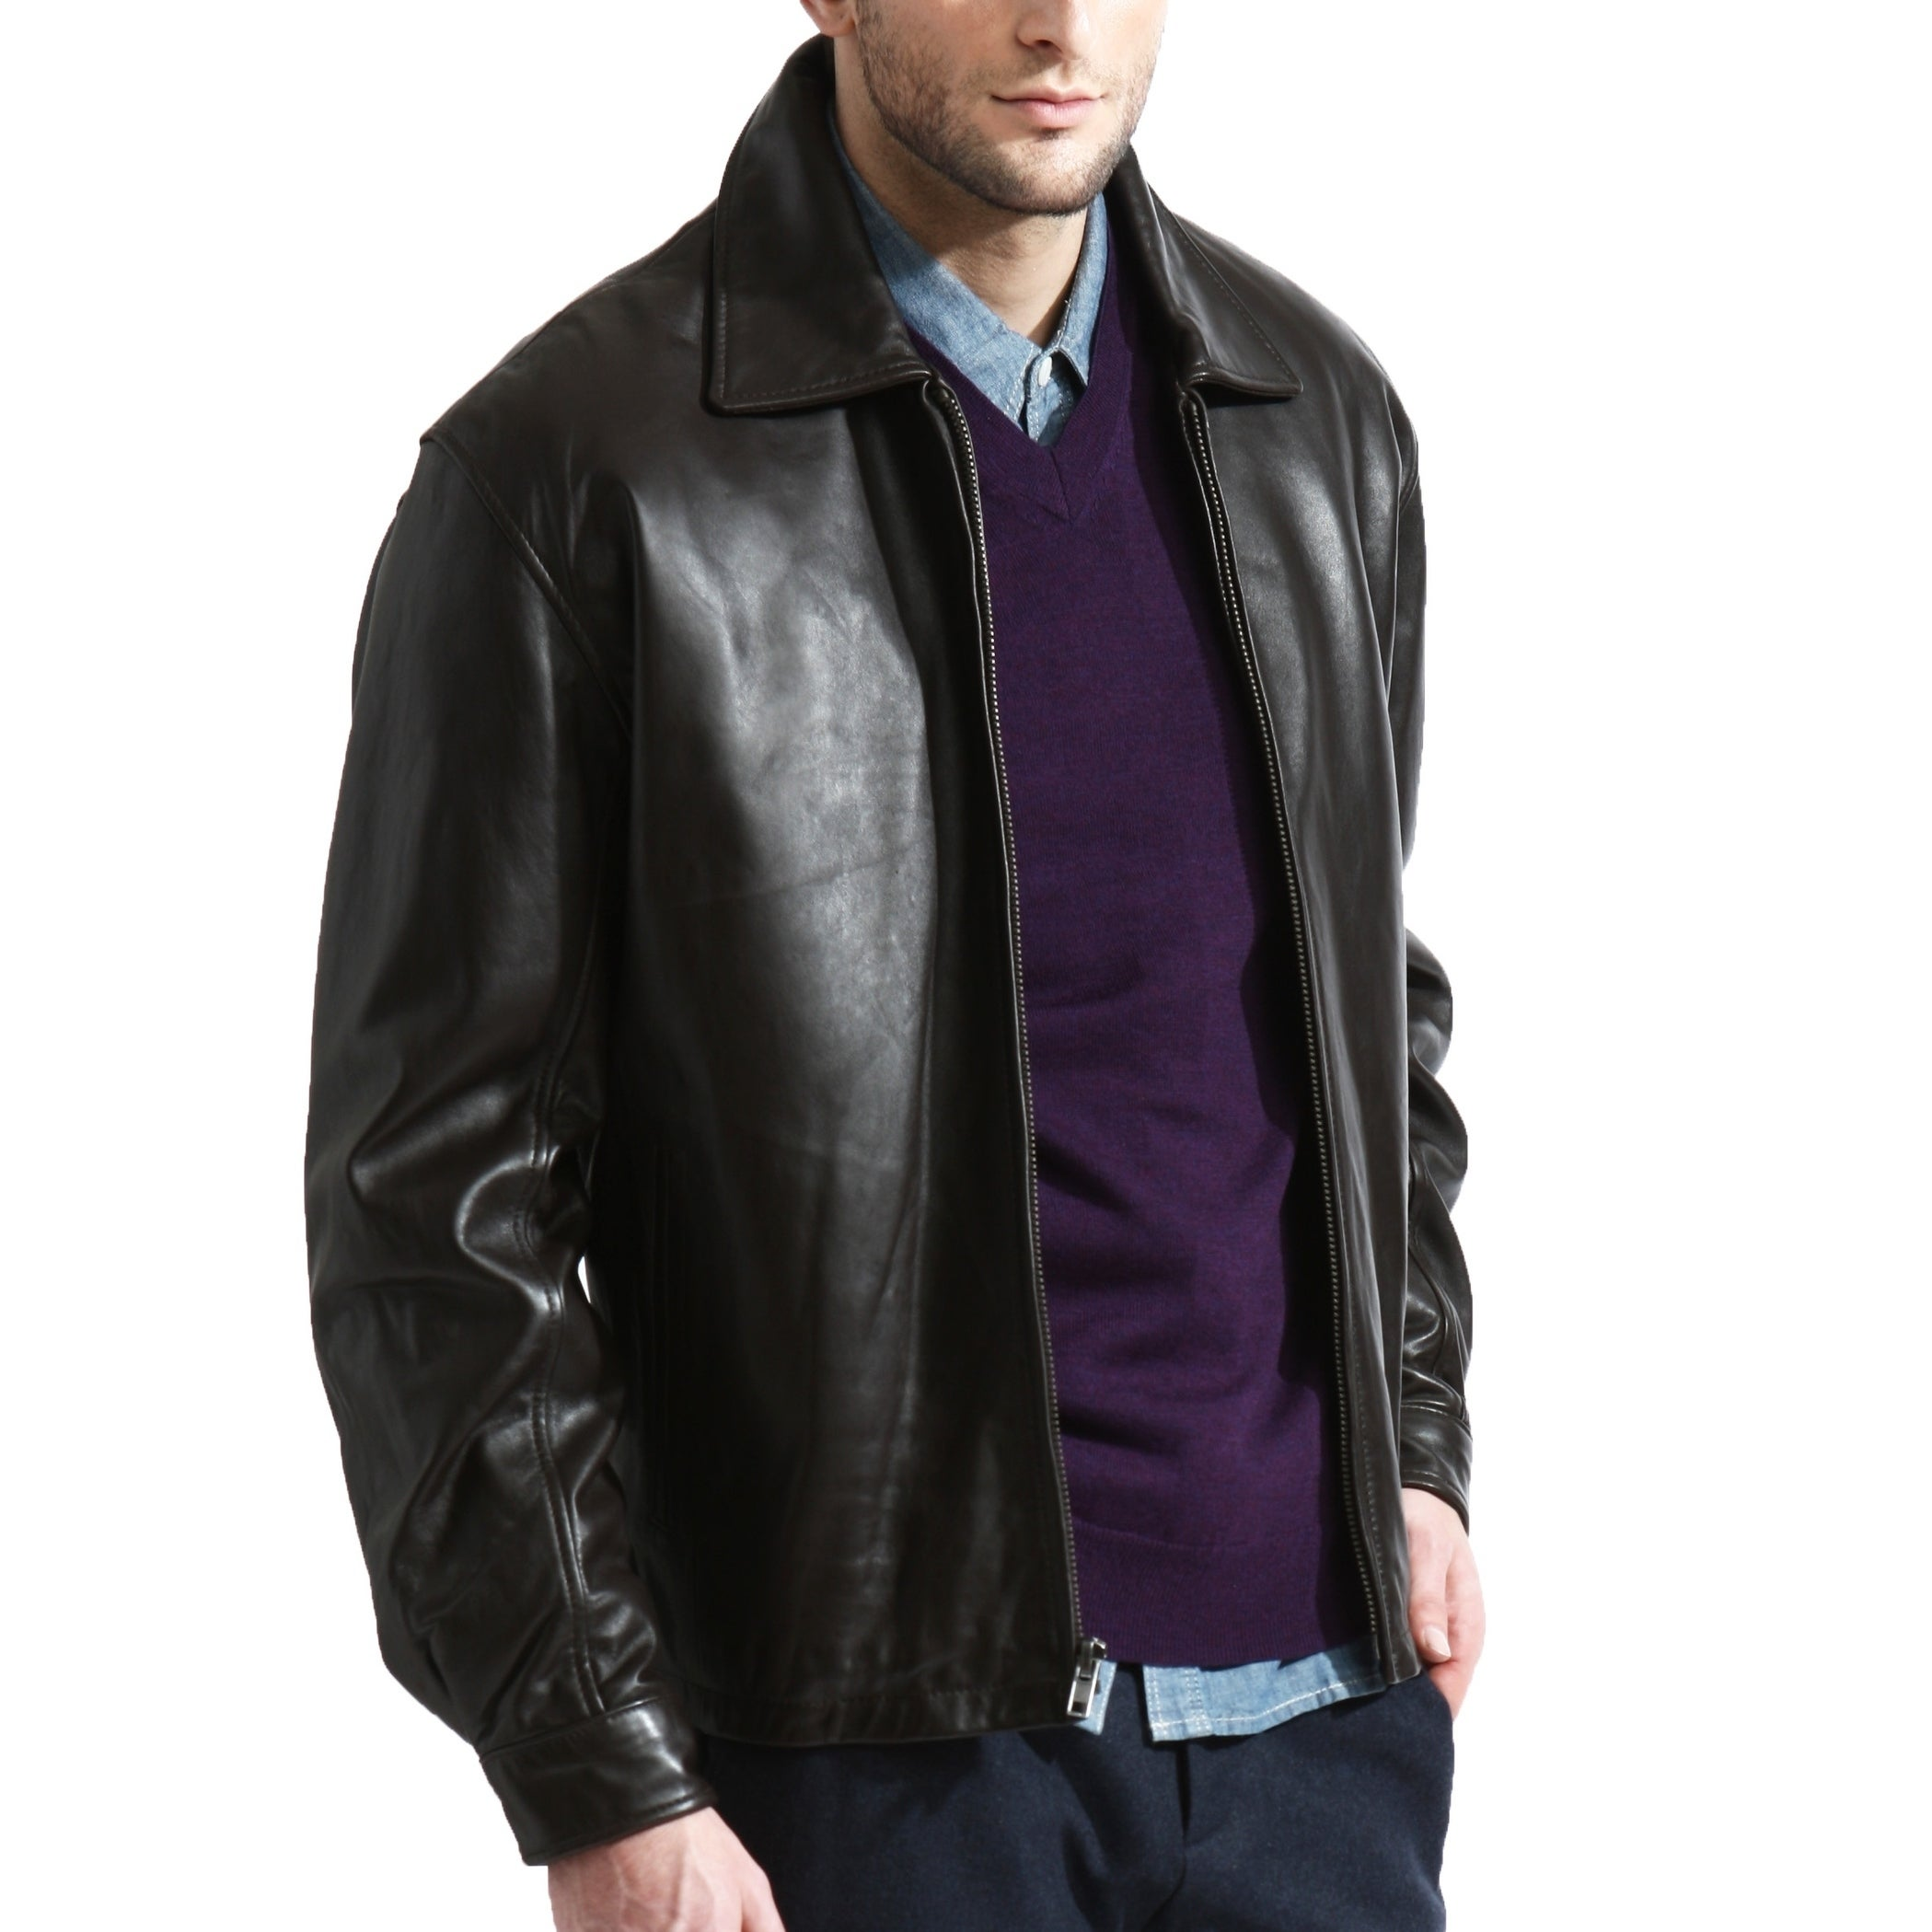 Black Lambskin Leather Classic Bomber Leather Jacket. Mens Leather Jacket